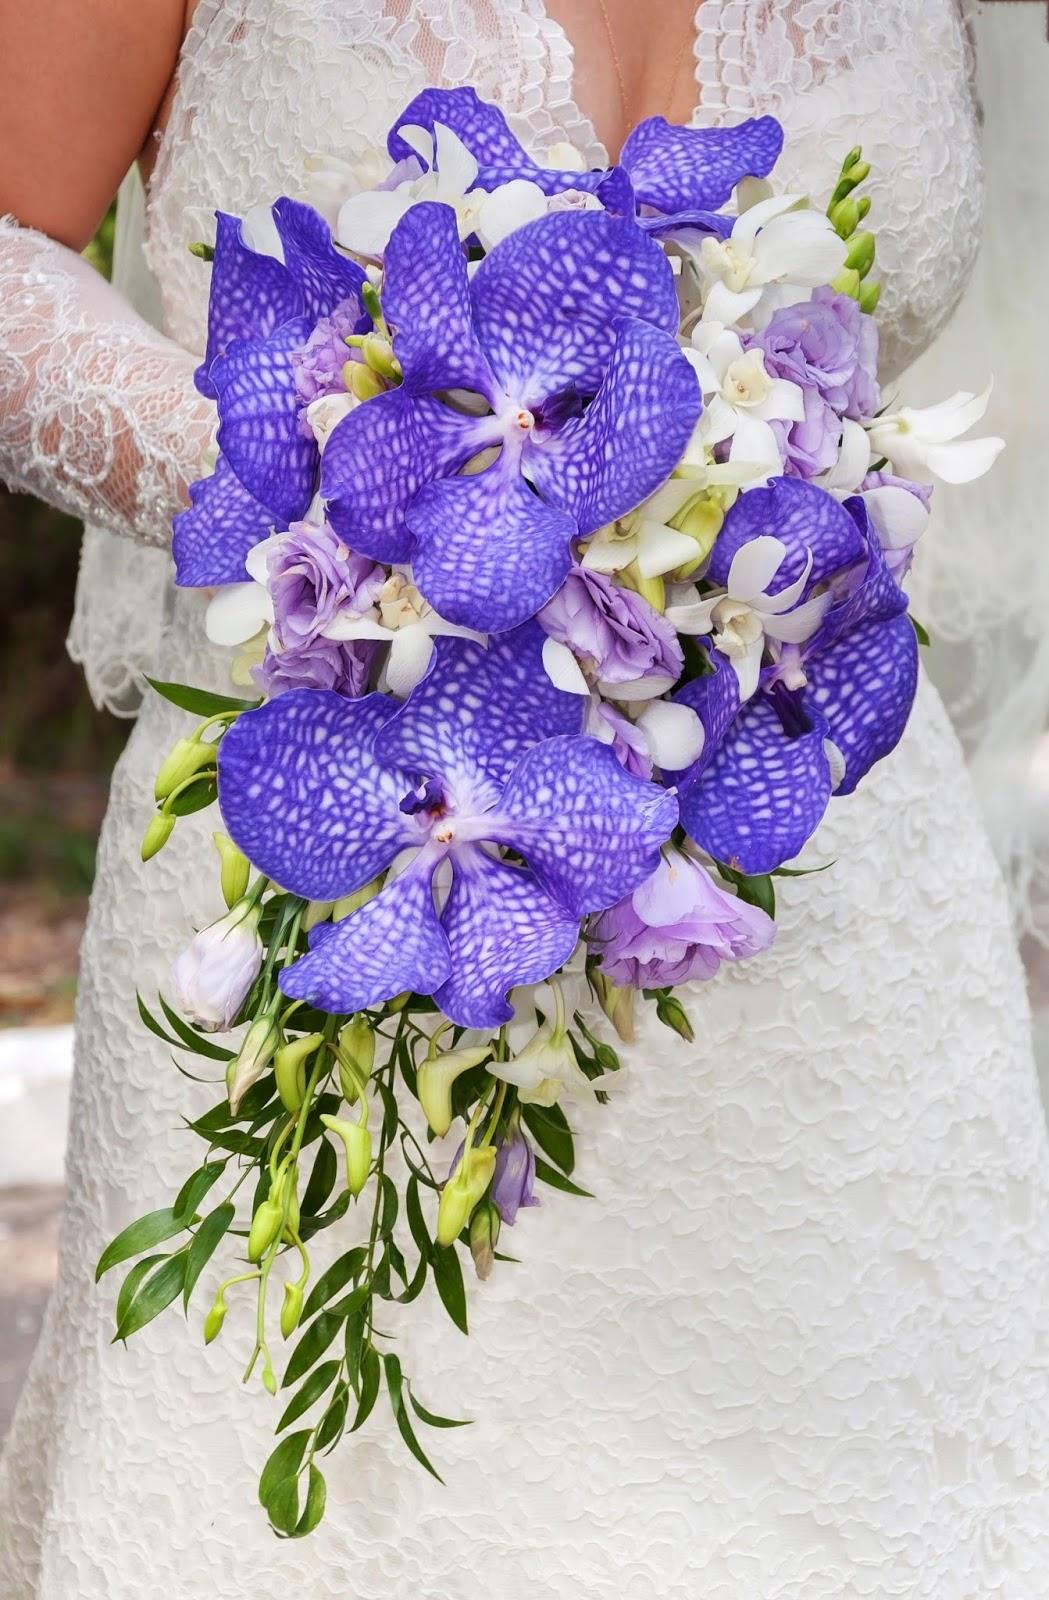 Rustic 4 Weddings: Bride Wedding Day Bouquet Pictures ...